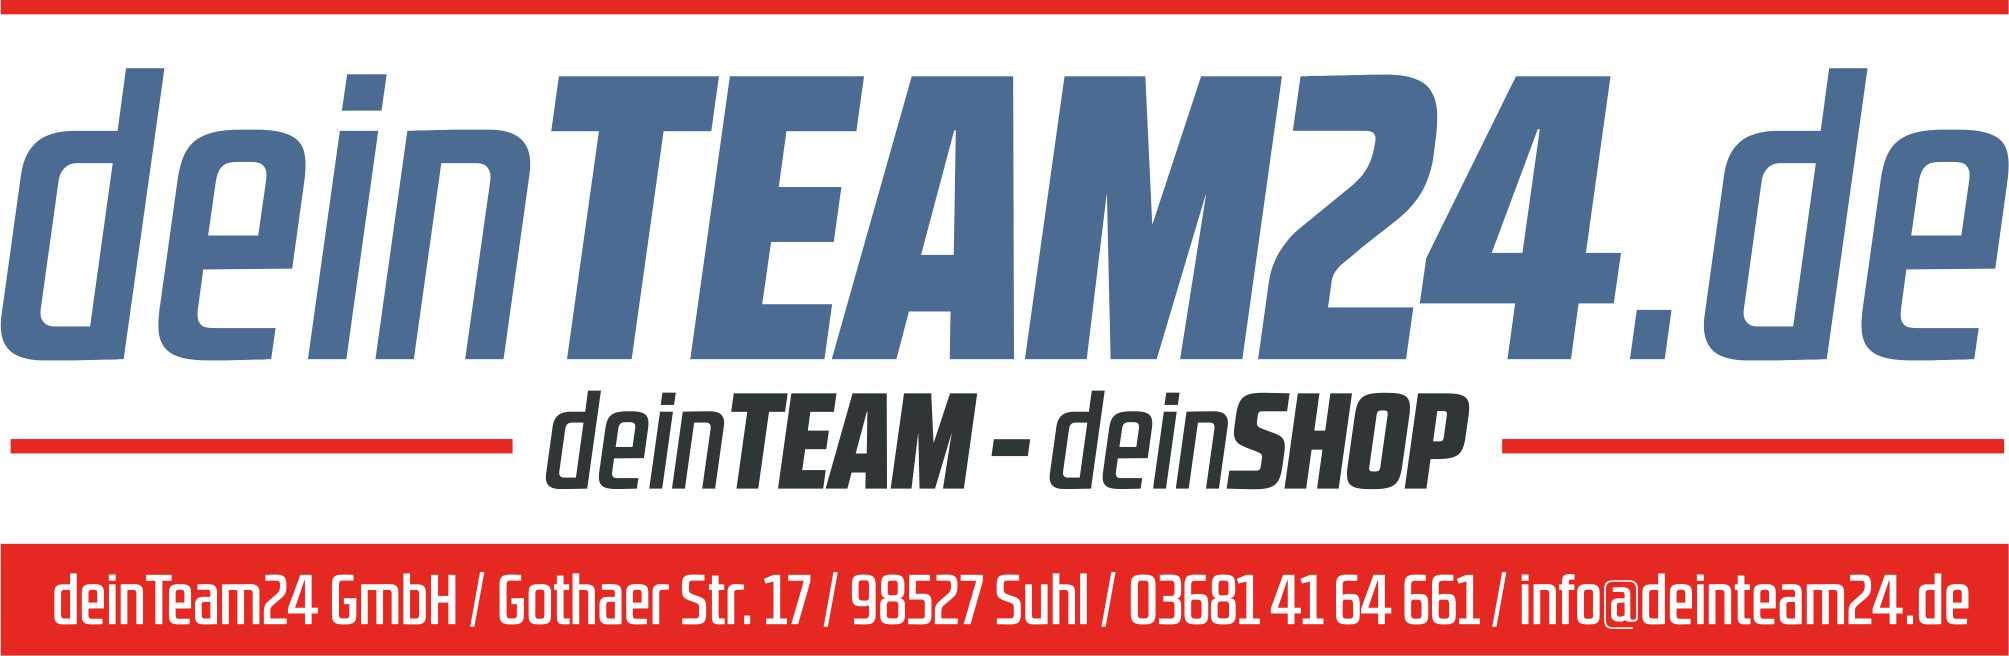 deinTeam24.de Logo 02 2017